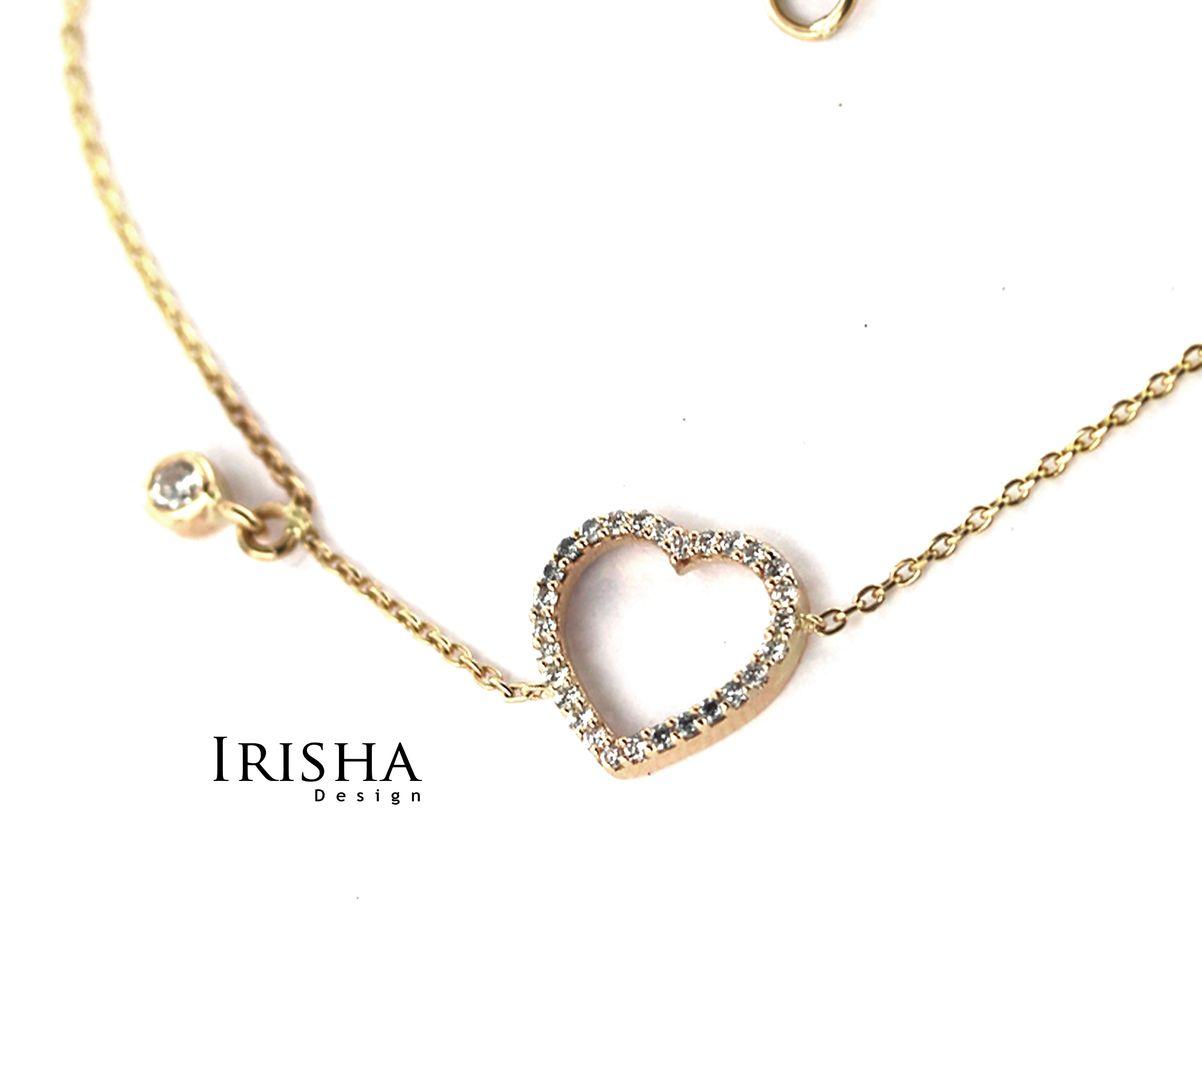 0.17 Ct. Genuine Diamonds VS Clarity Heart Chain Friendship Bracelet 14K Gold